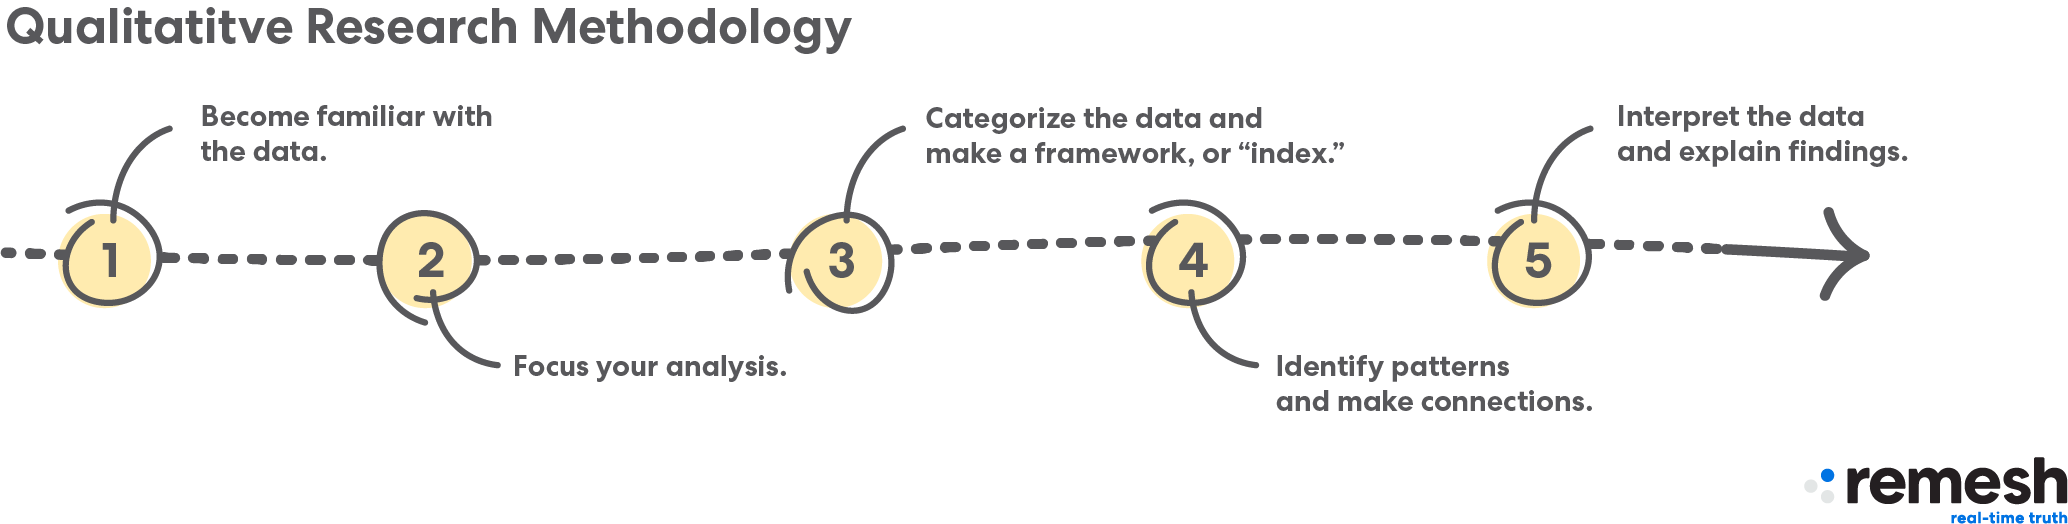 Qualitative Research Methodology